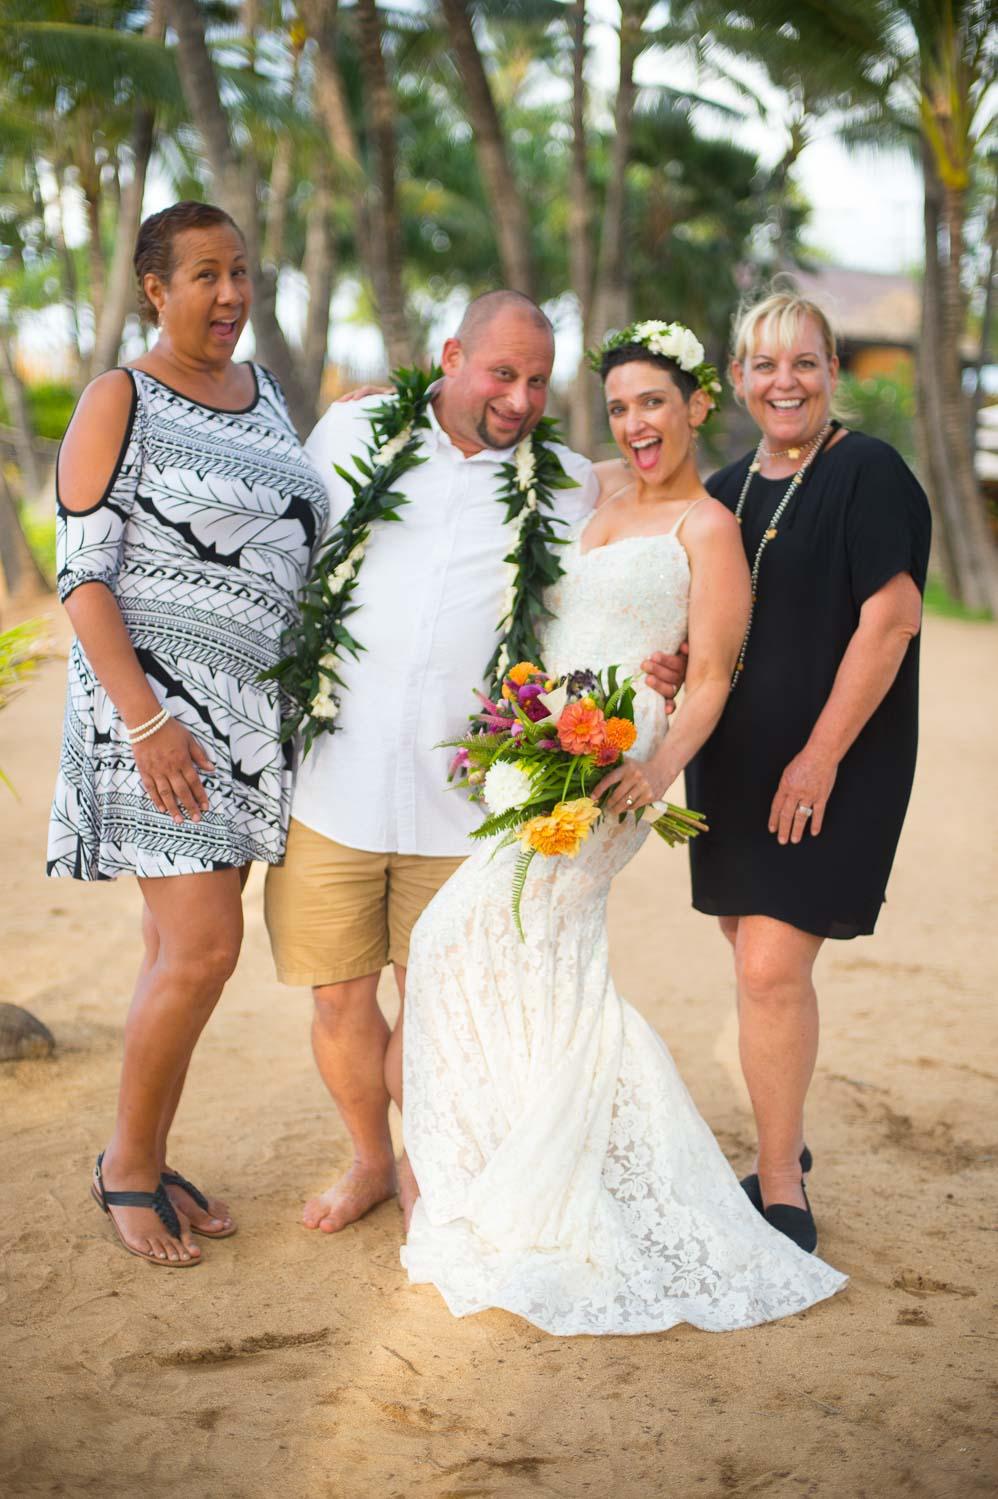 maui-wedding-photography-maui-wedding-venue-Tad-Craig-Photography-4-1.jpg